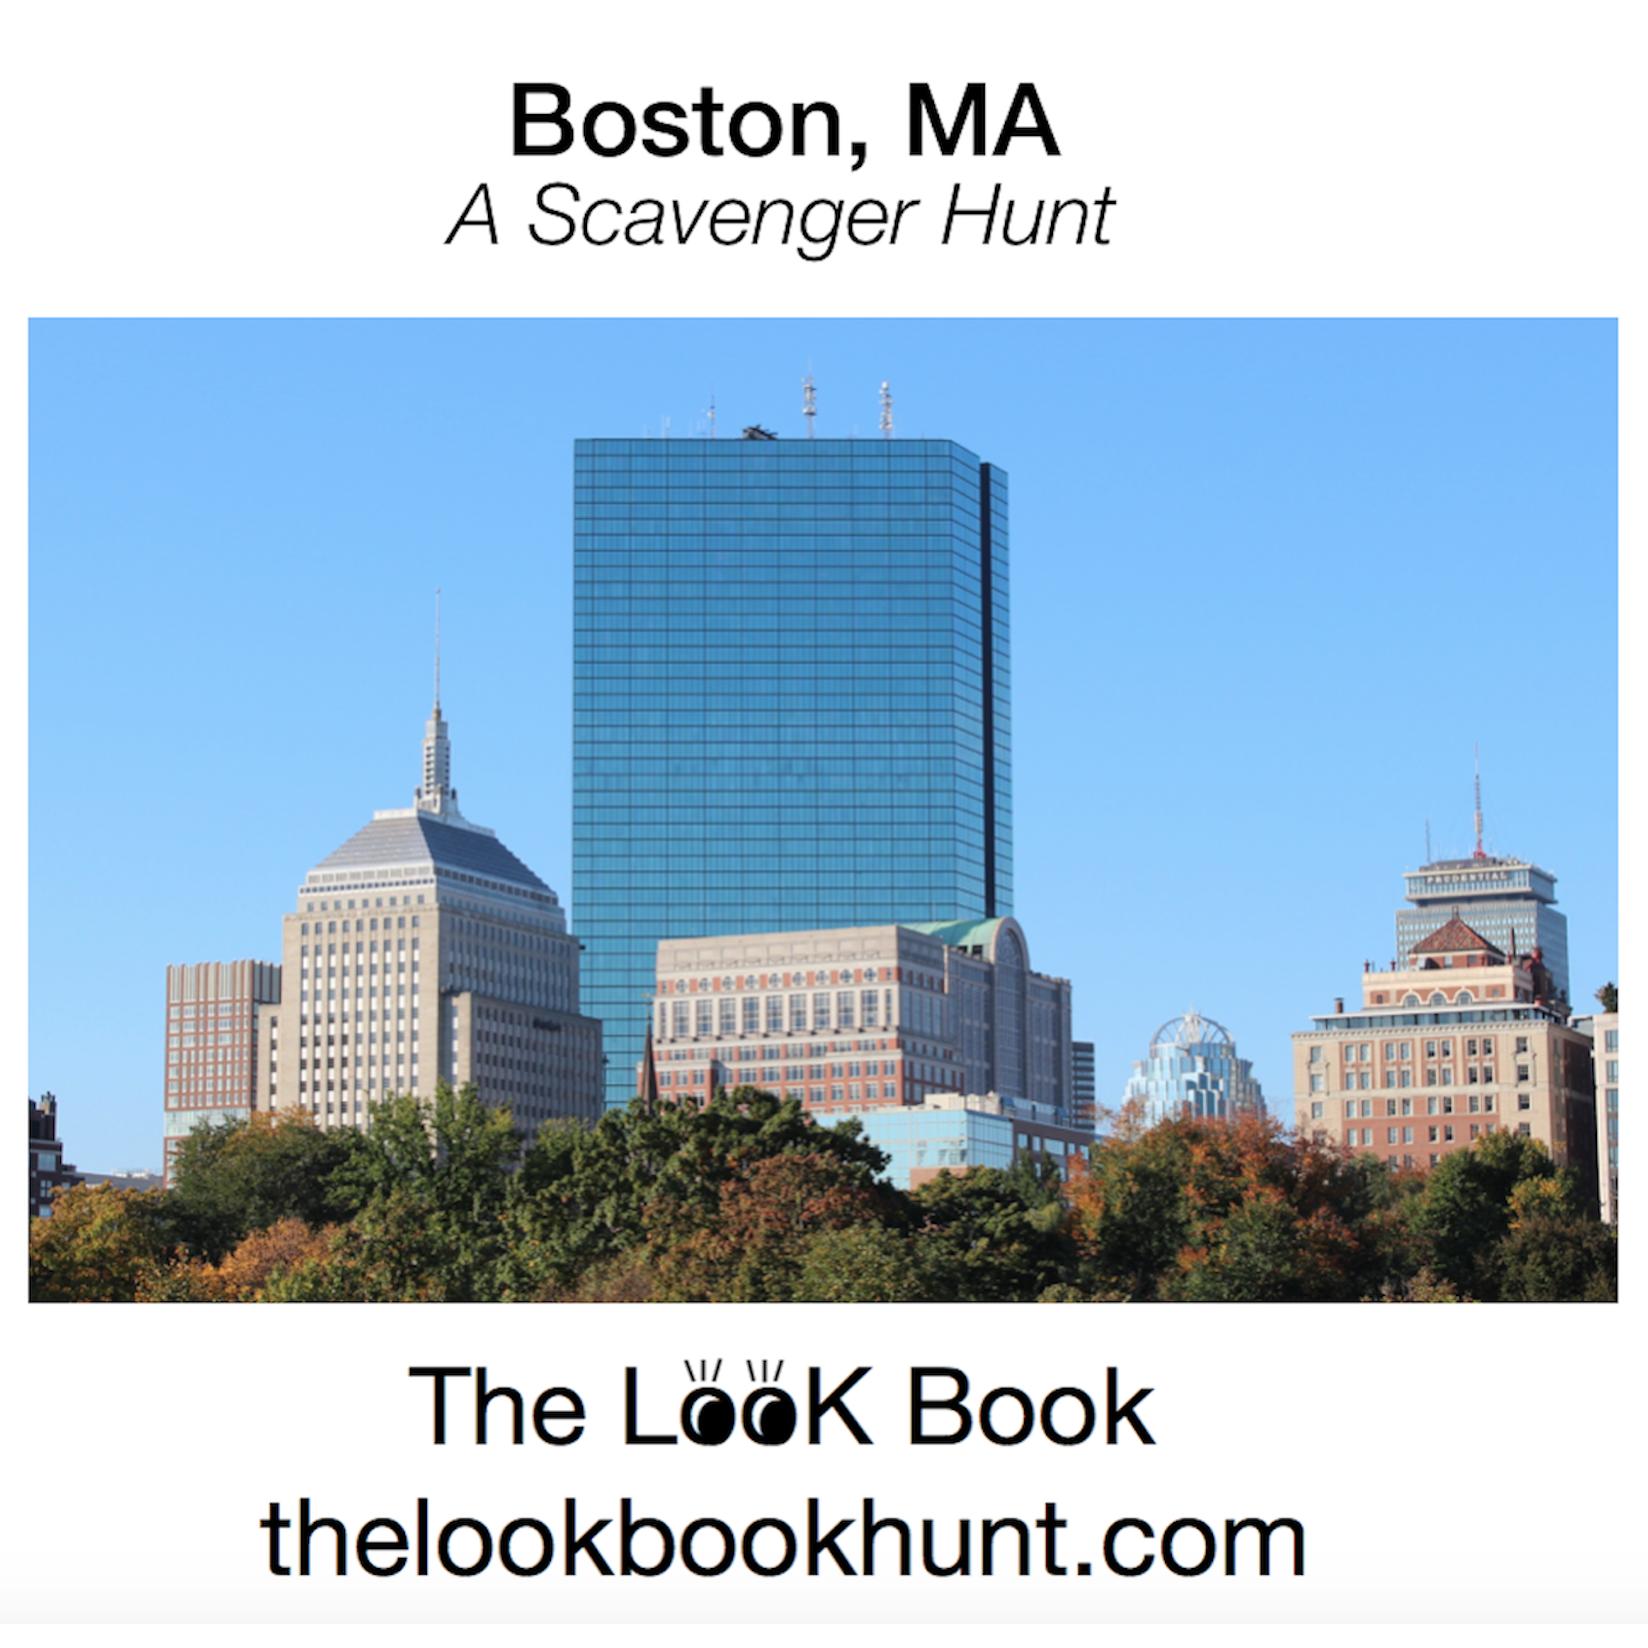 Boston, MA - LookBook Hunt